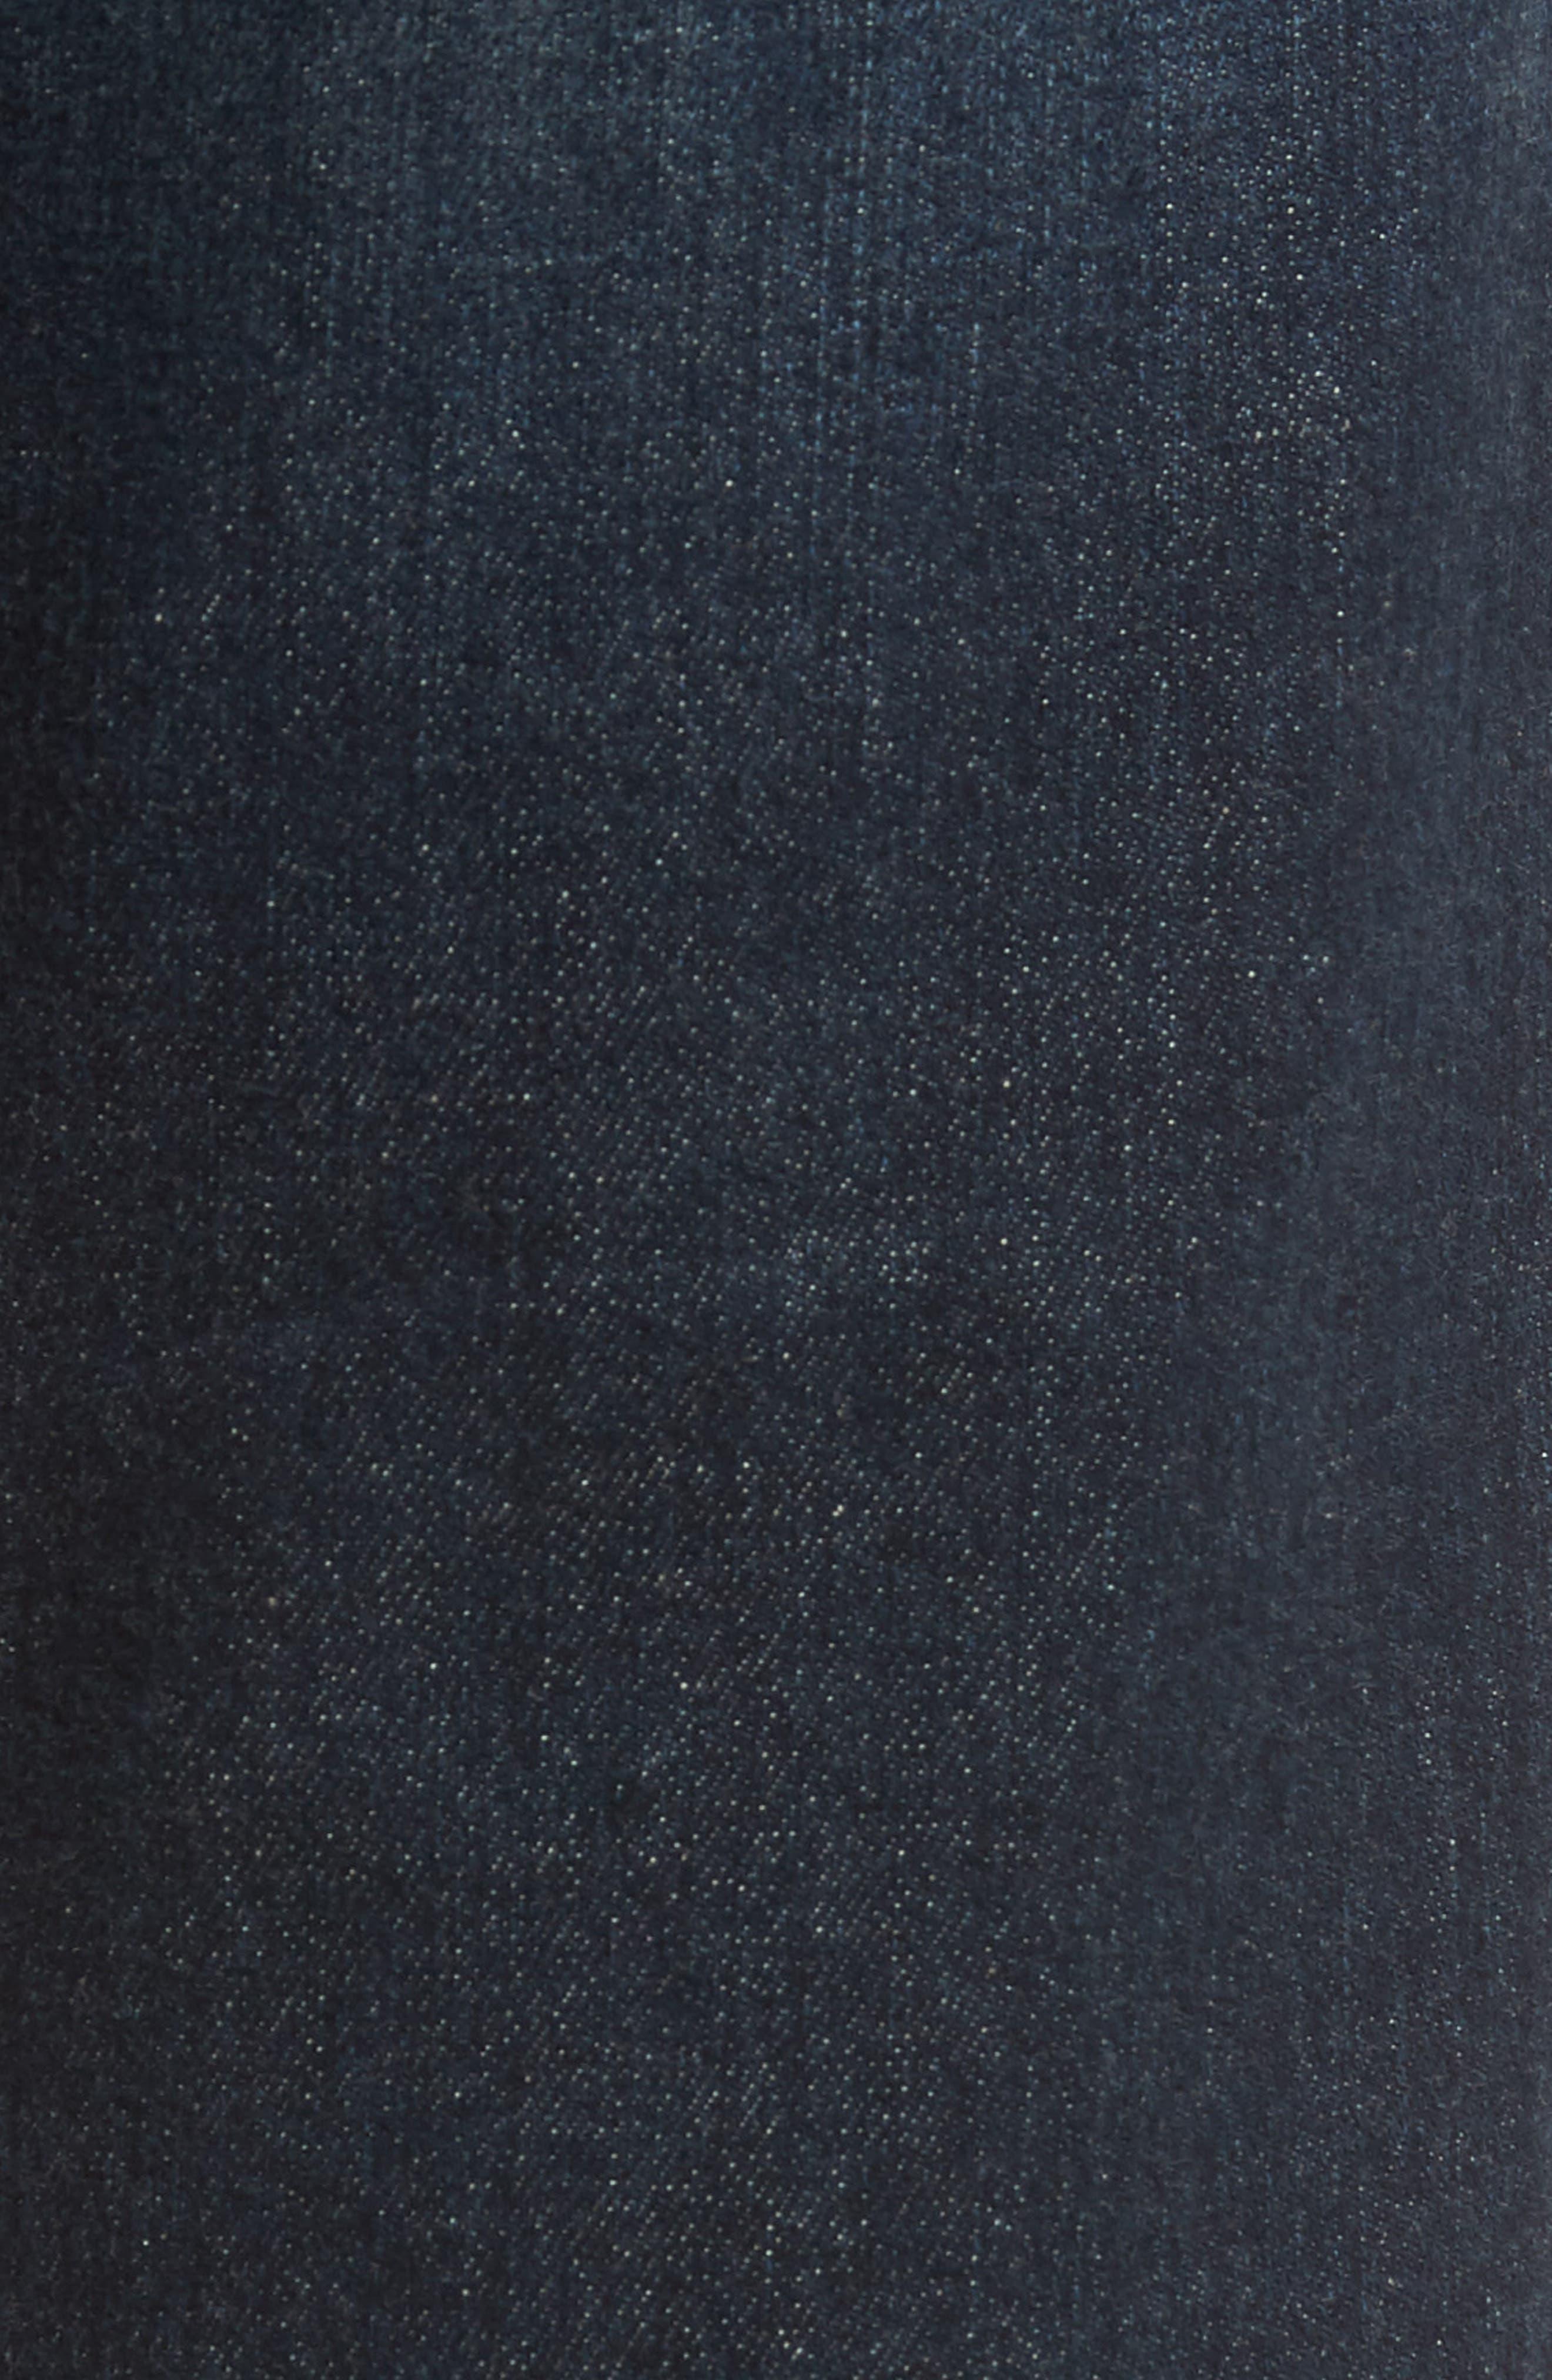 L'Homme Slim Fit Jeans,                             Alternate thumbnail 5, color,                             JOSHUA TREE